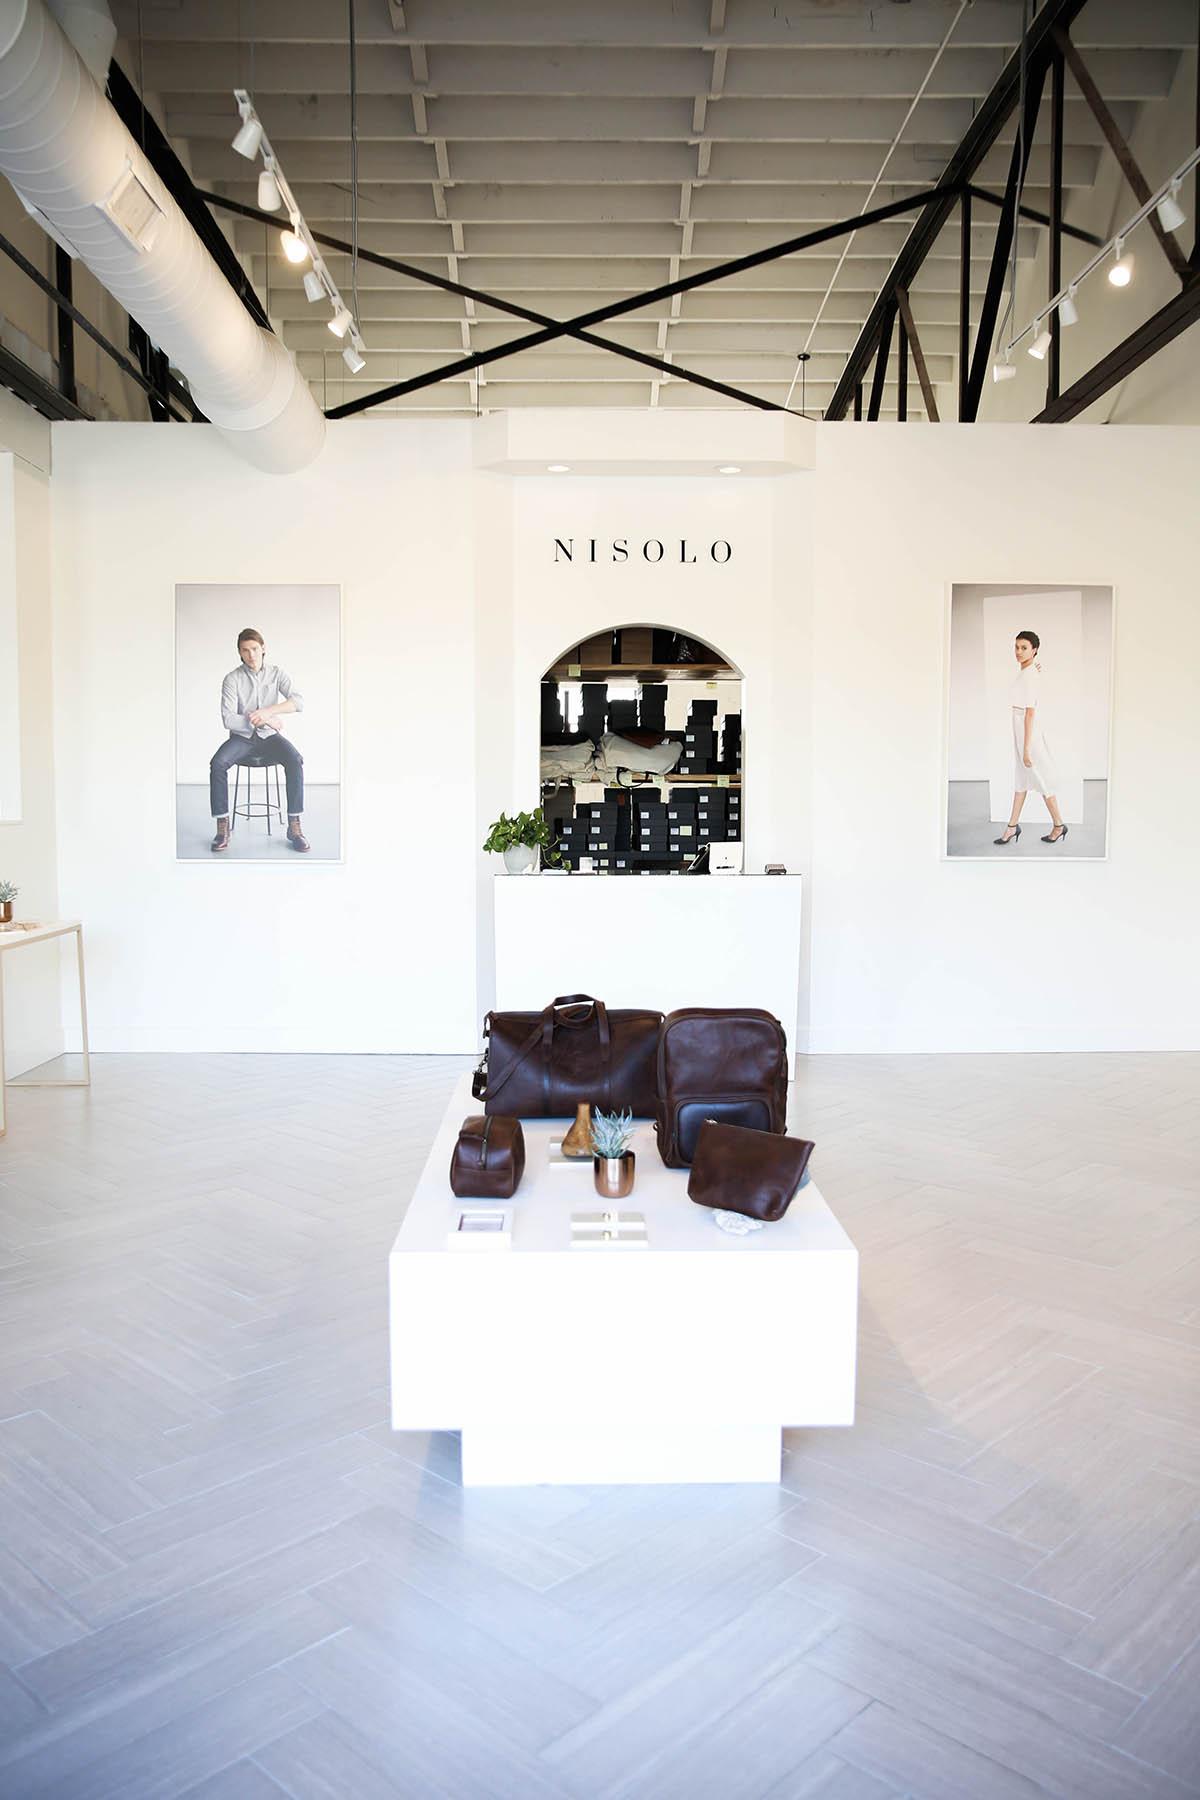 Nashville clothing boutiques Nisolo